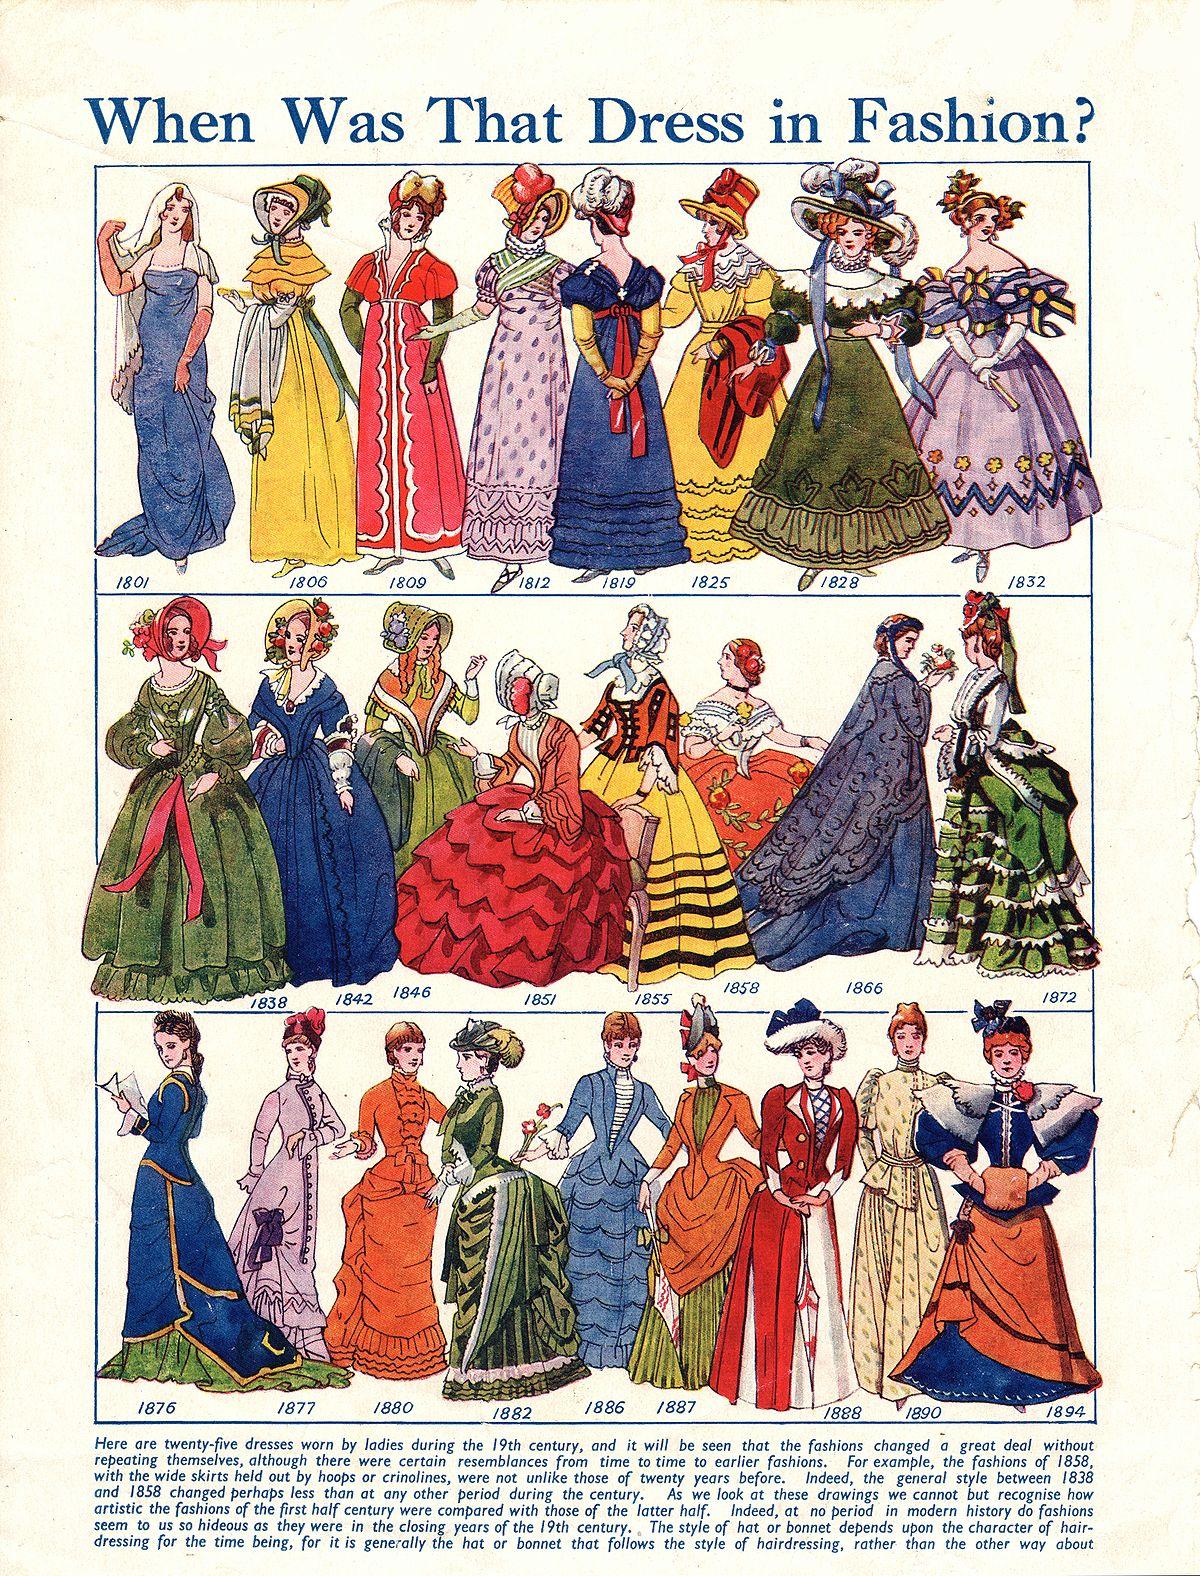 d136c063c882a الموضة الفيكتورية - ويكيبيديا، الموسوعة الحرة